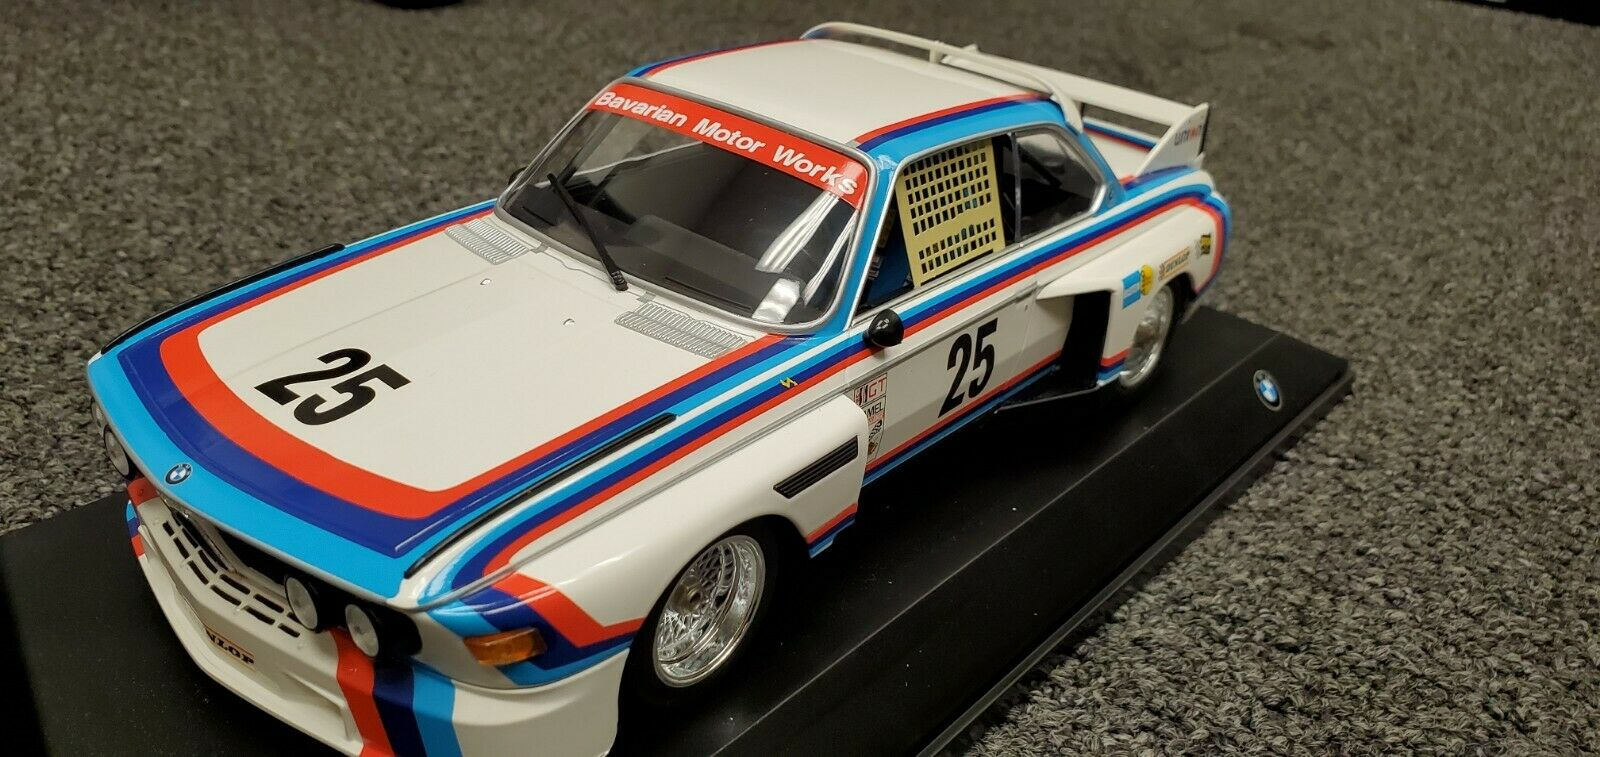 BMW 3.0 CSL Coupe Equipo BMW Motorsport N 25 ganador 12h Sebring 1975 Diecast Modelo